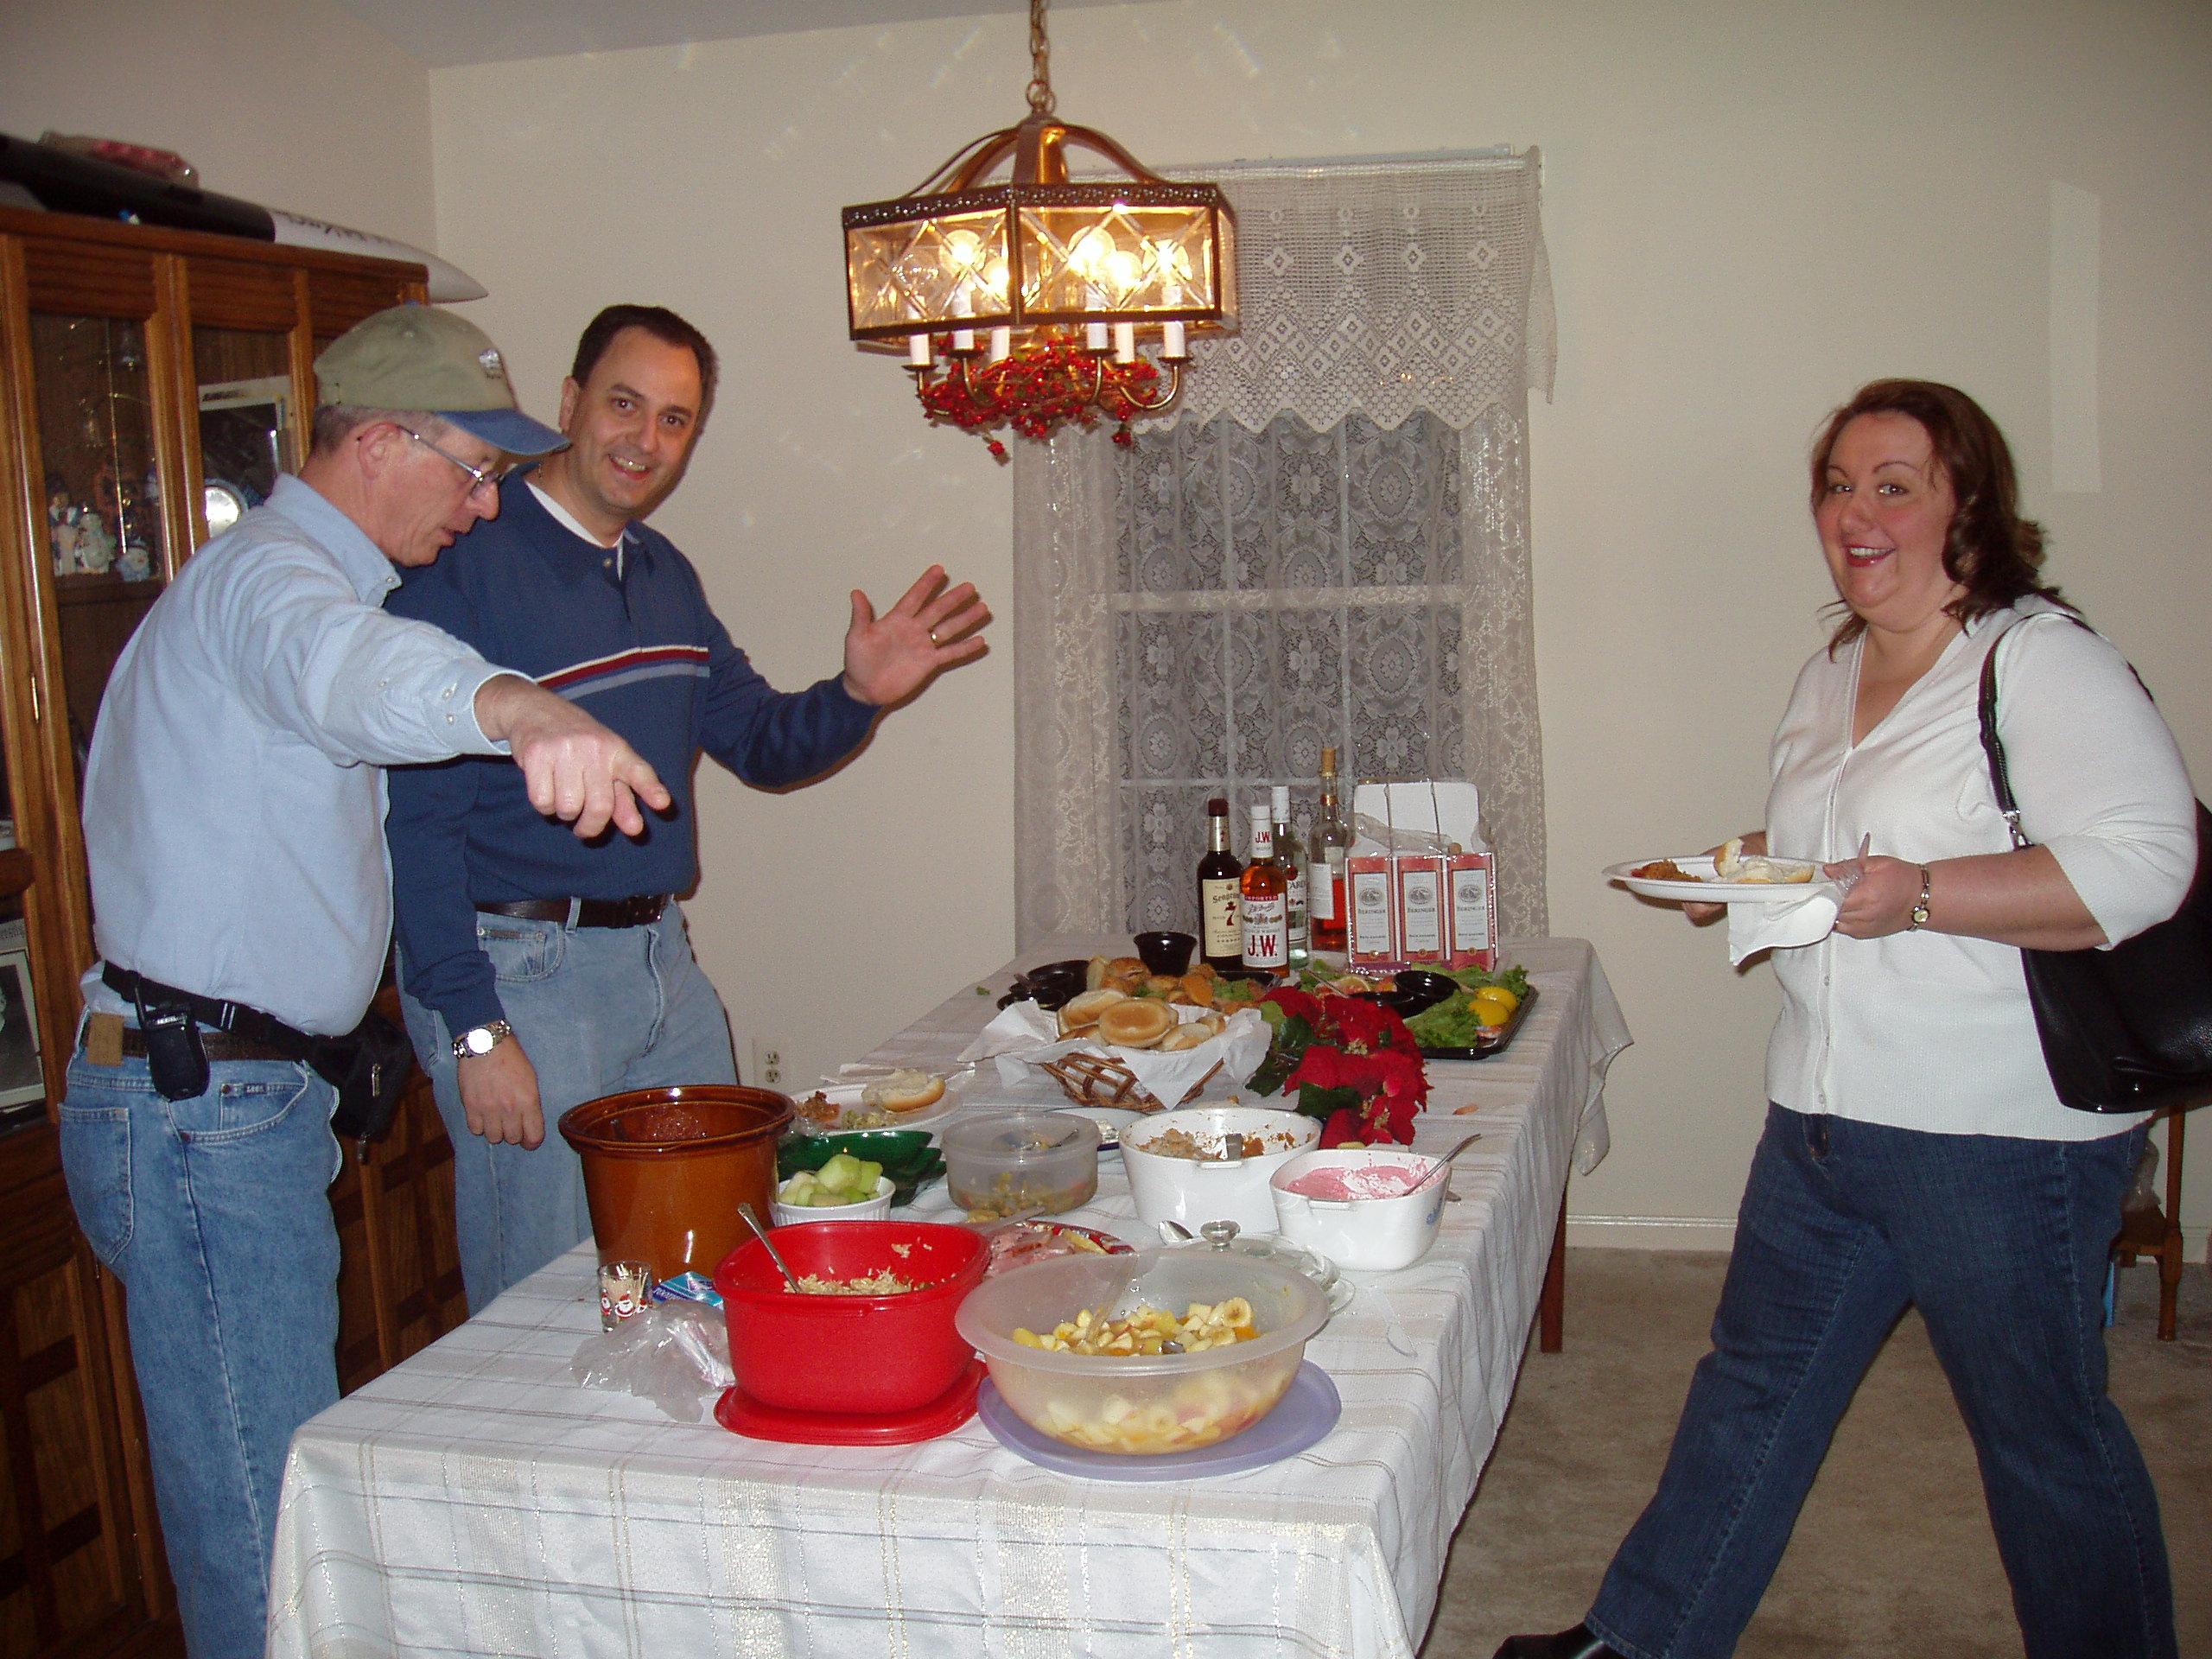 2004 OVH XMAS PARTY - John Z, David and Erika Meola